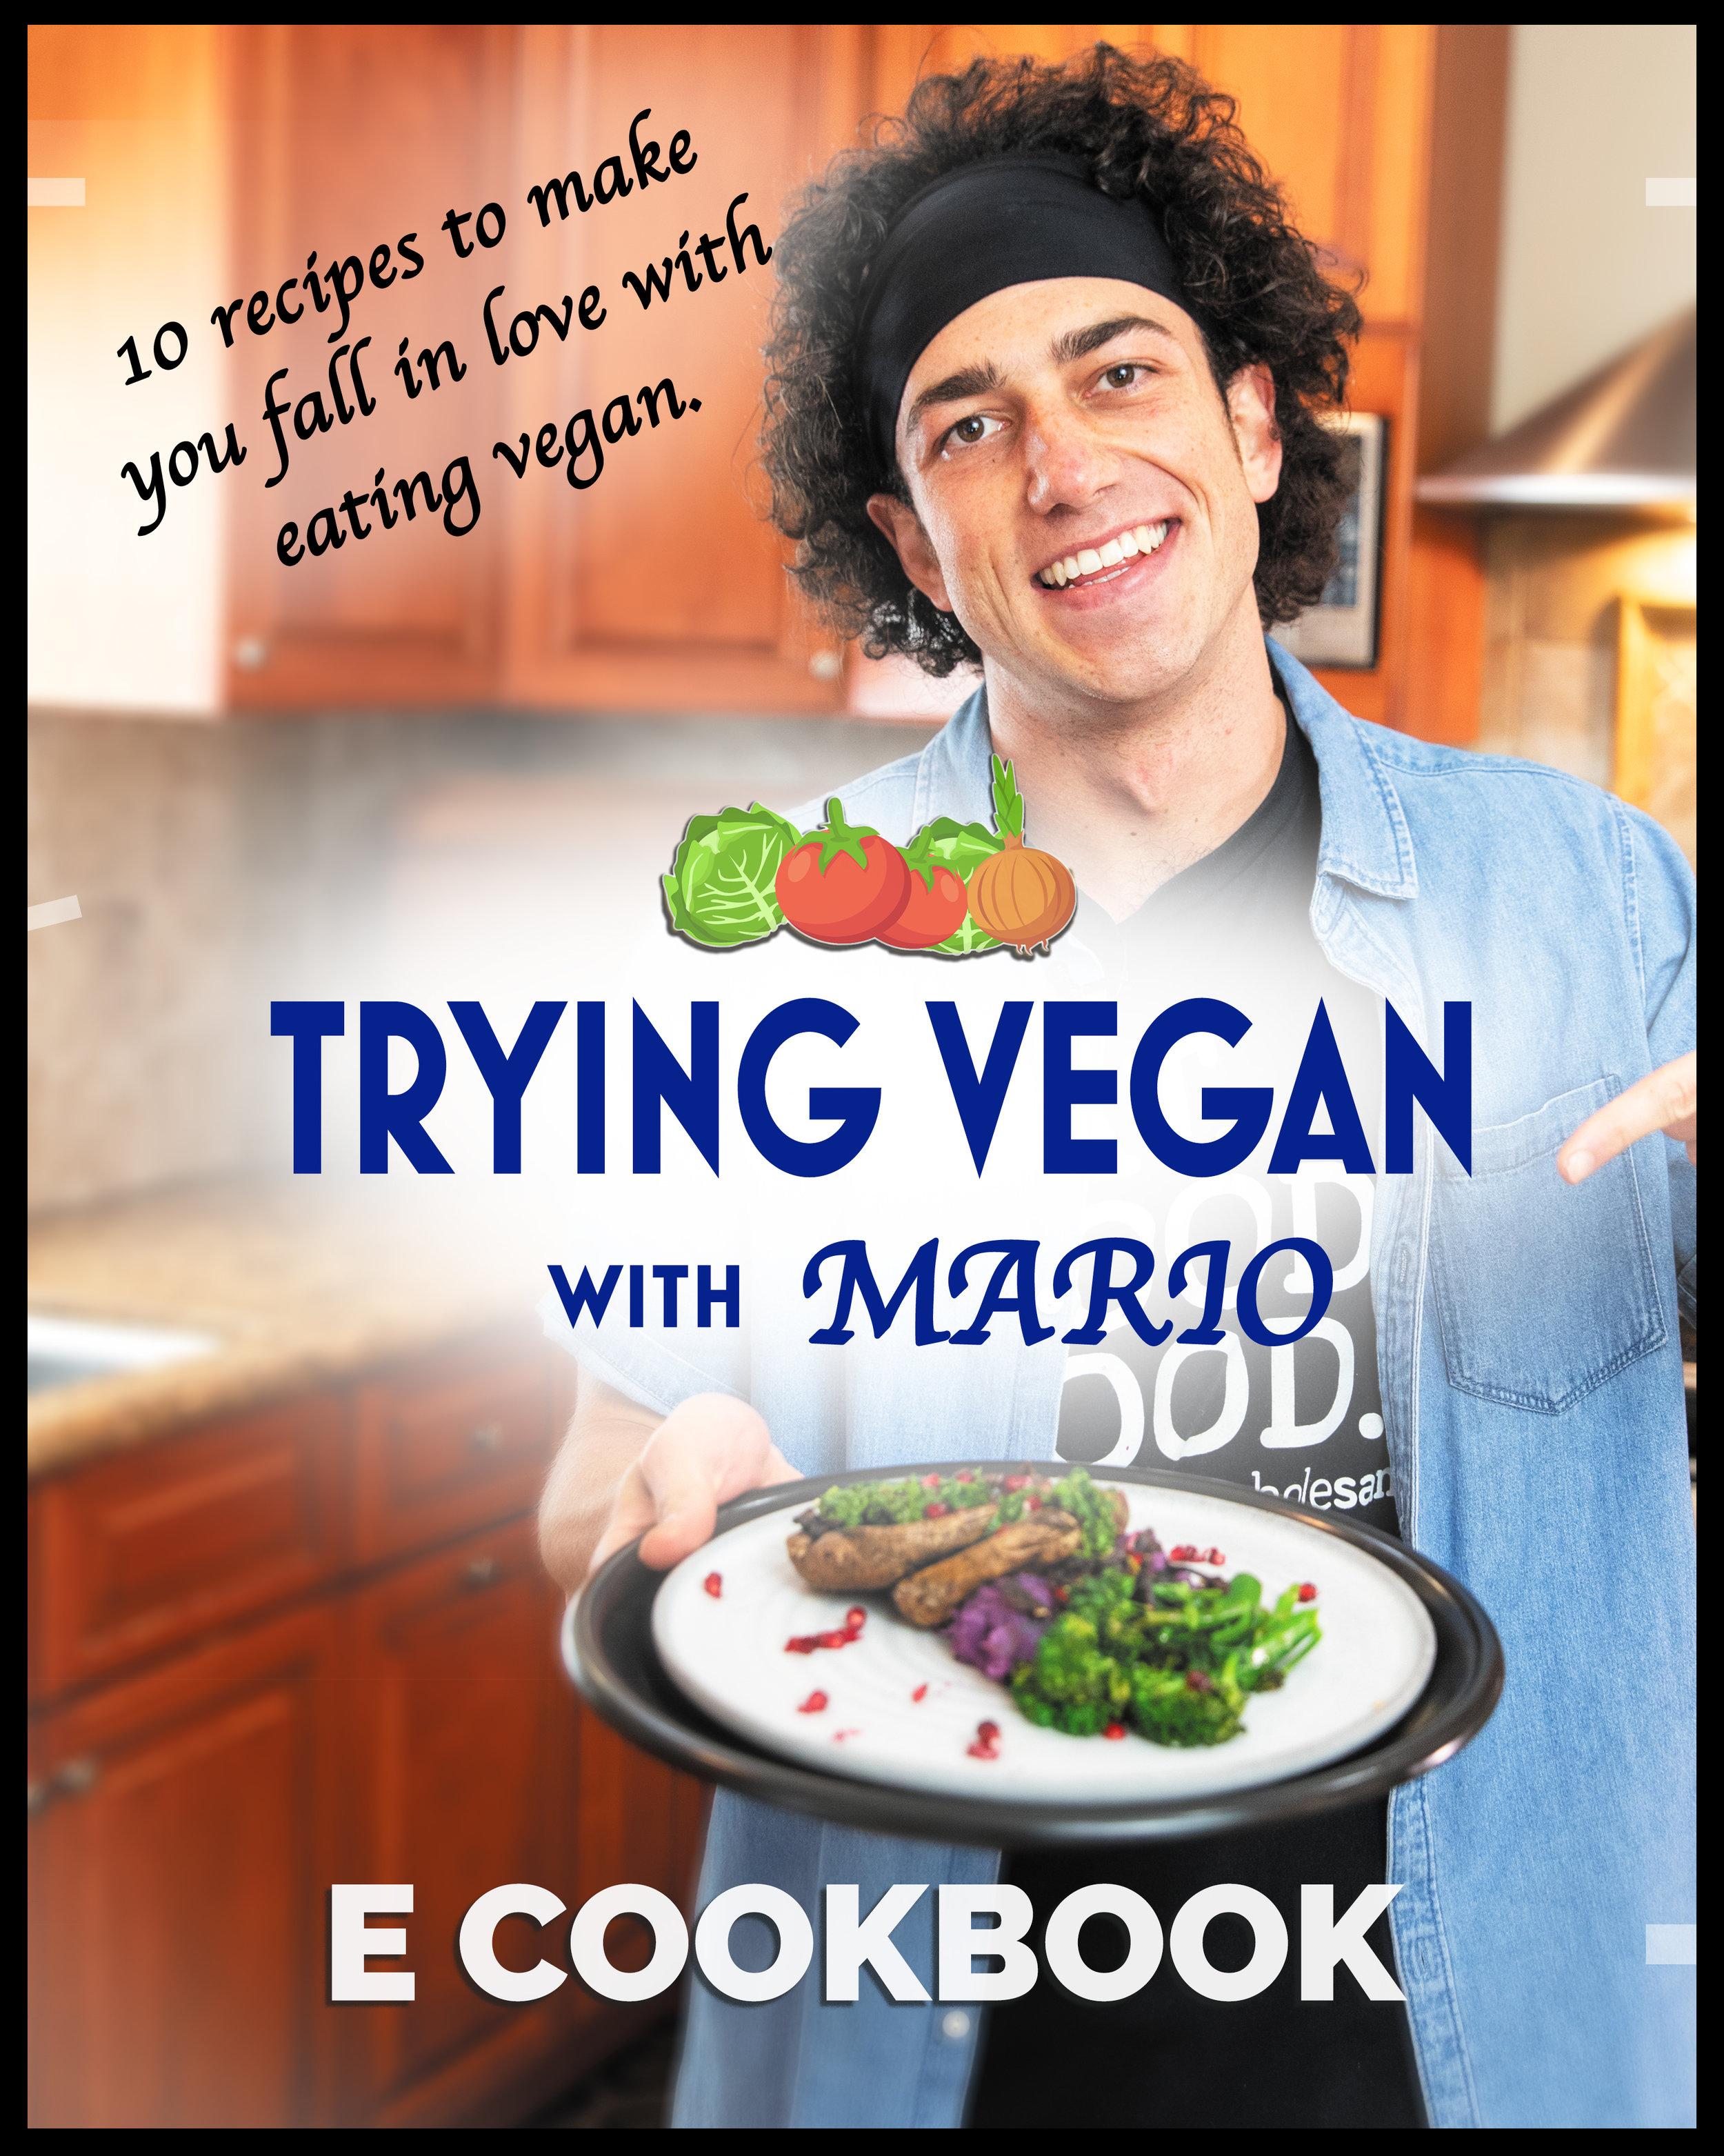 Mario-Fabbri-Cookbook.jpg